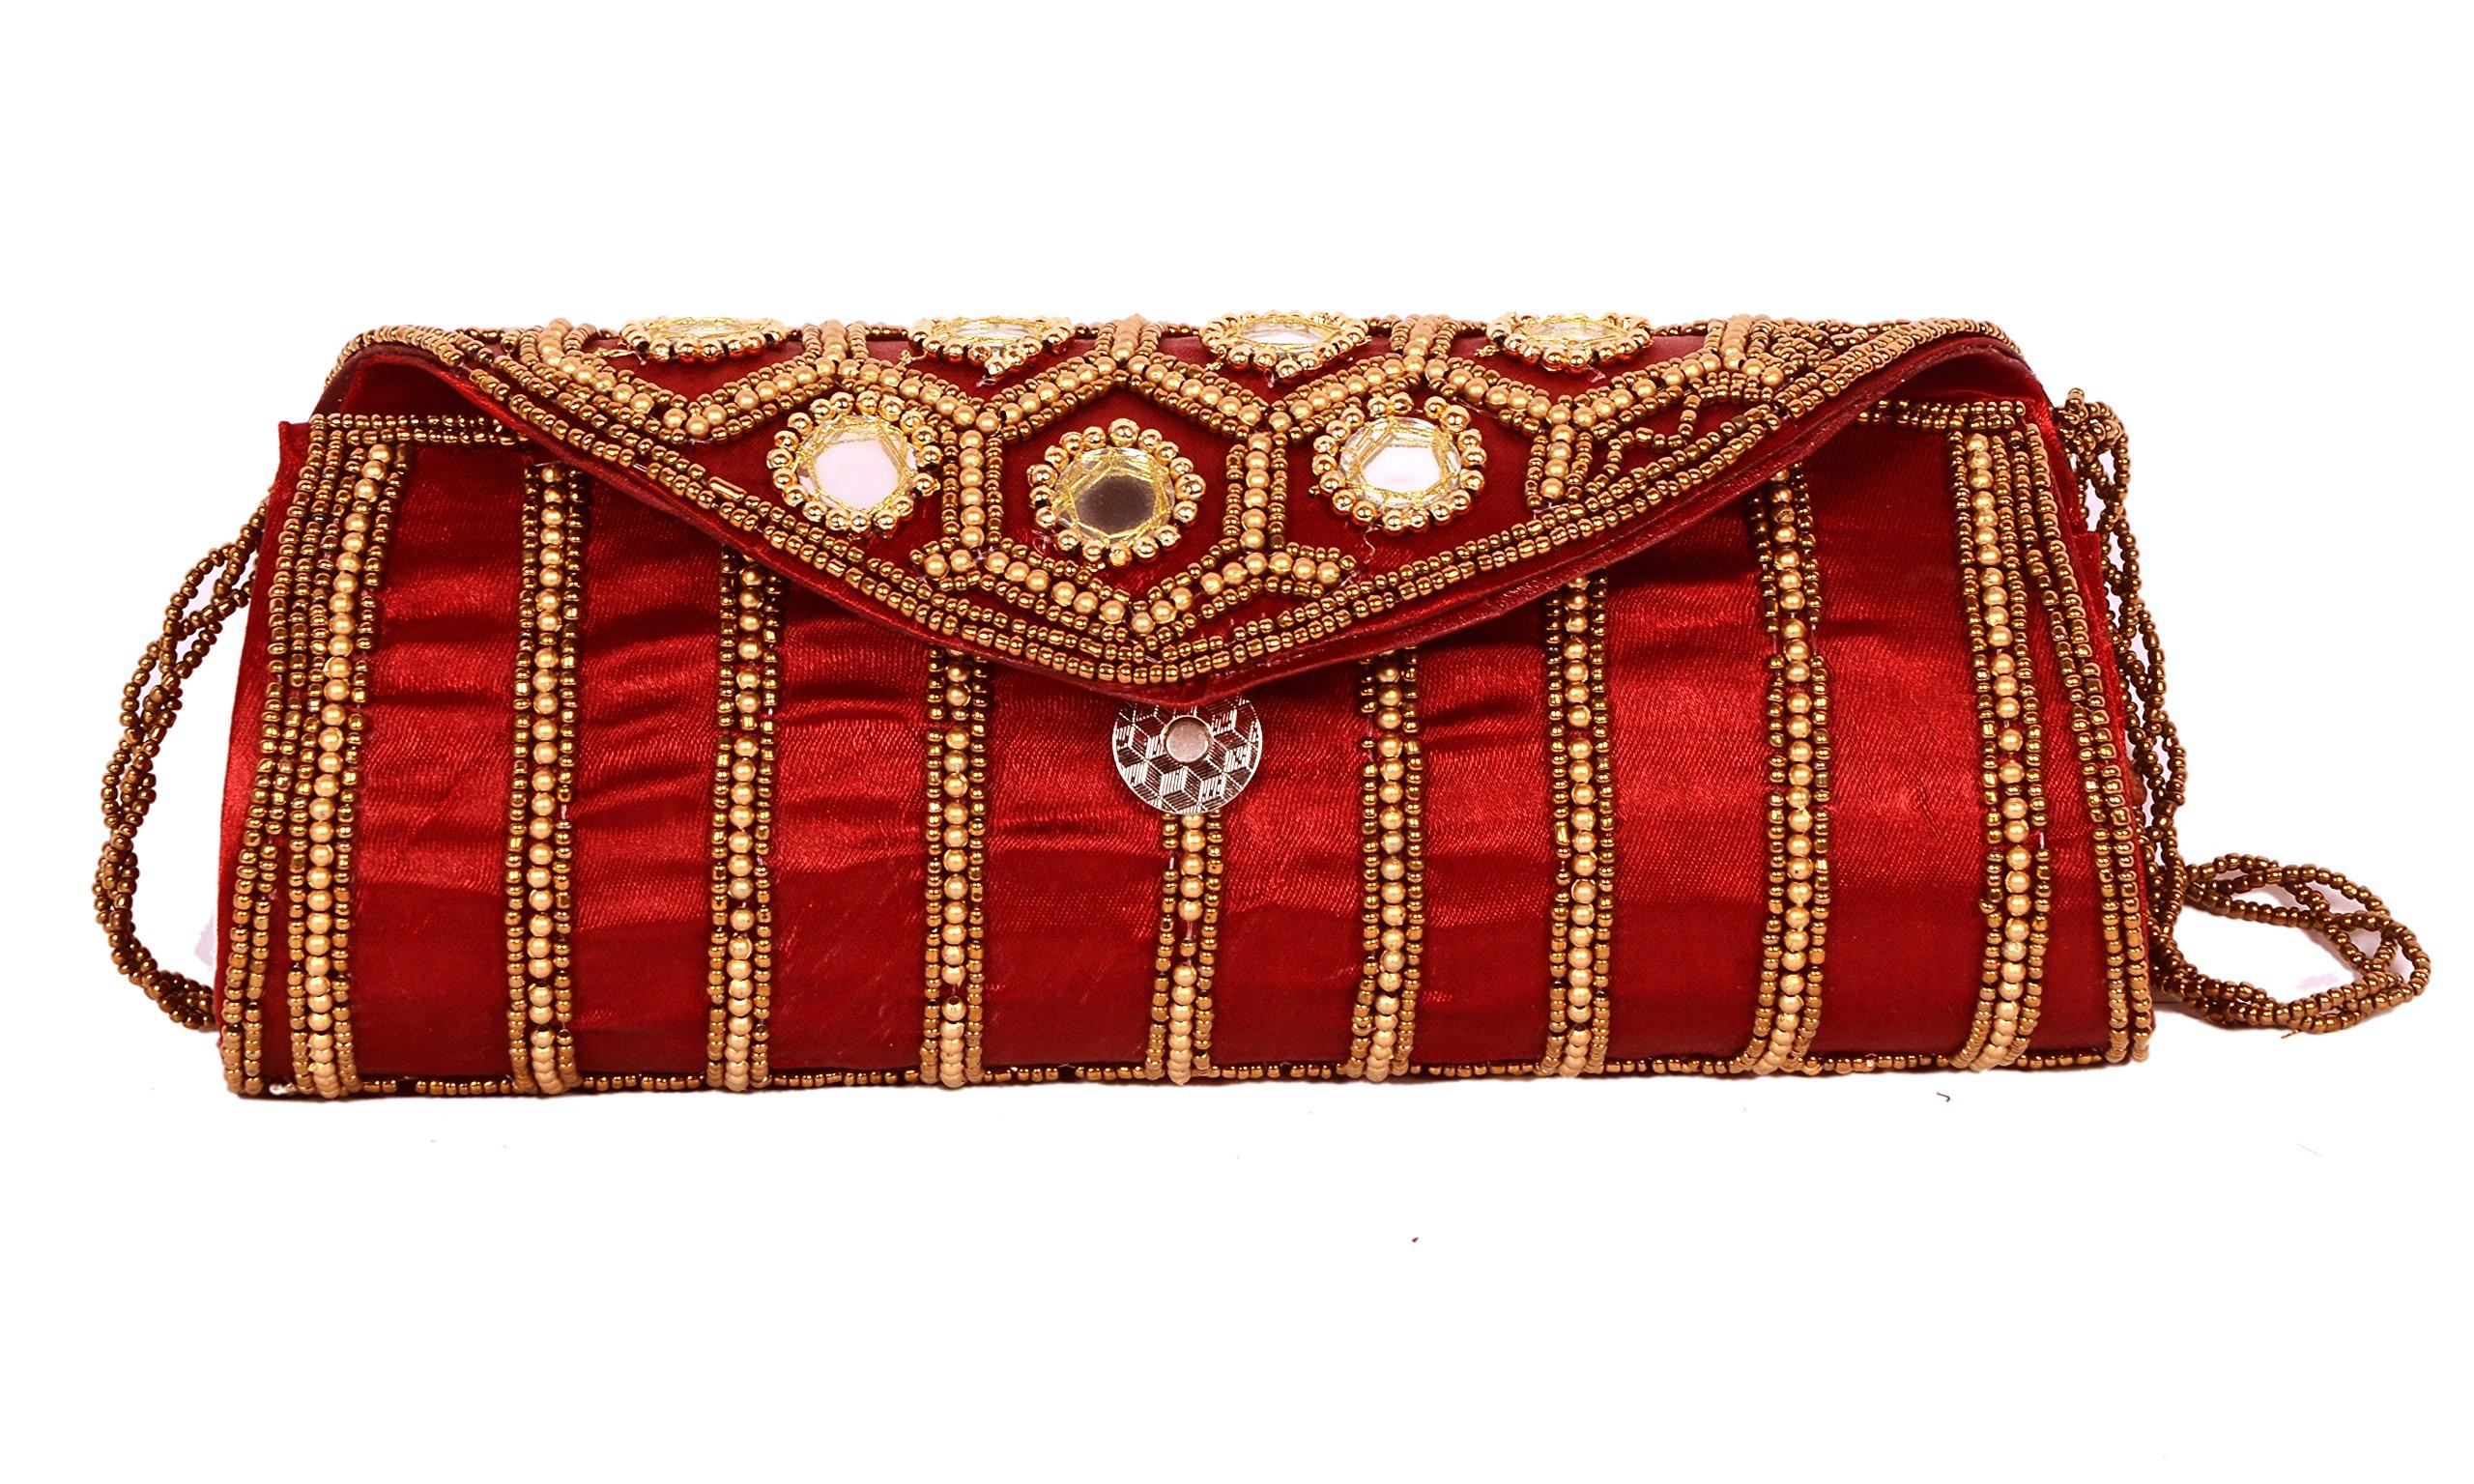 Women Sizzling Jaipuriya Style Hand-Cum-Wedding Clutch - Cherry Color by Suman Enterprises